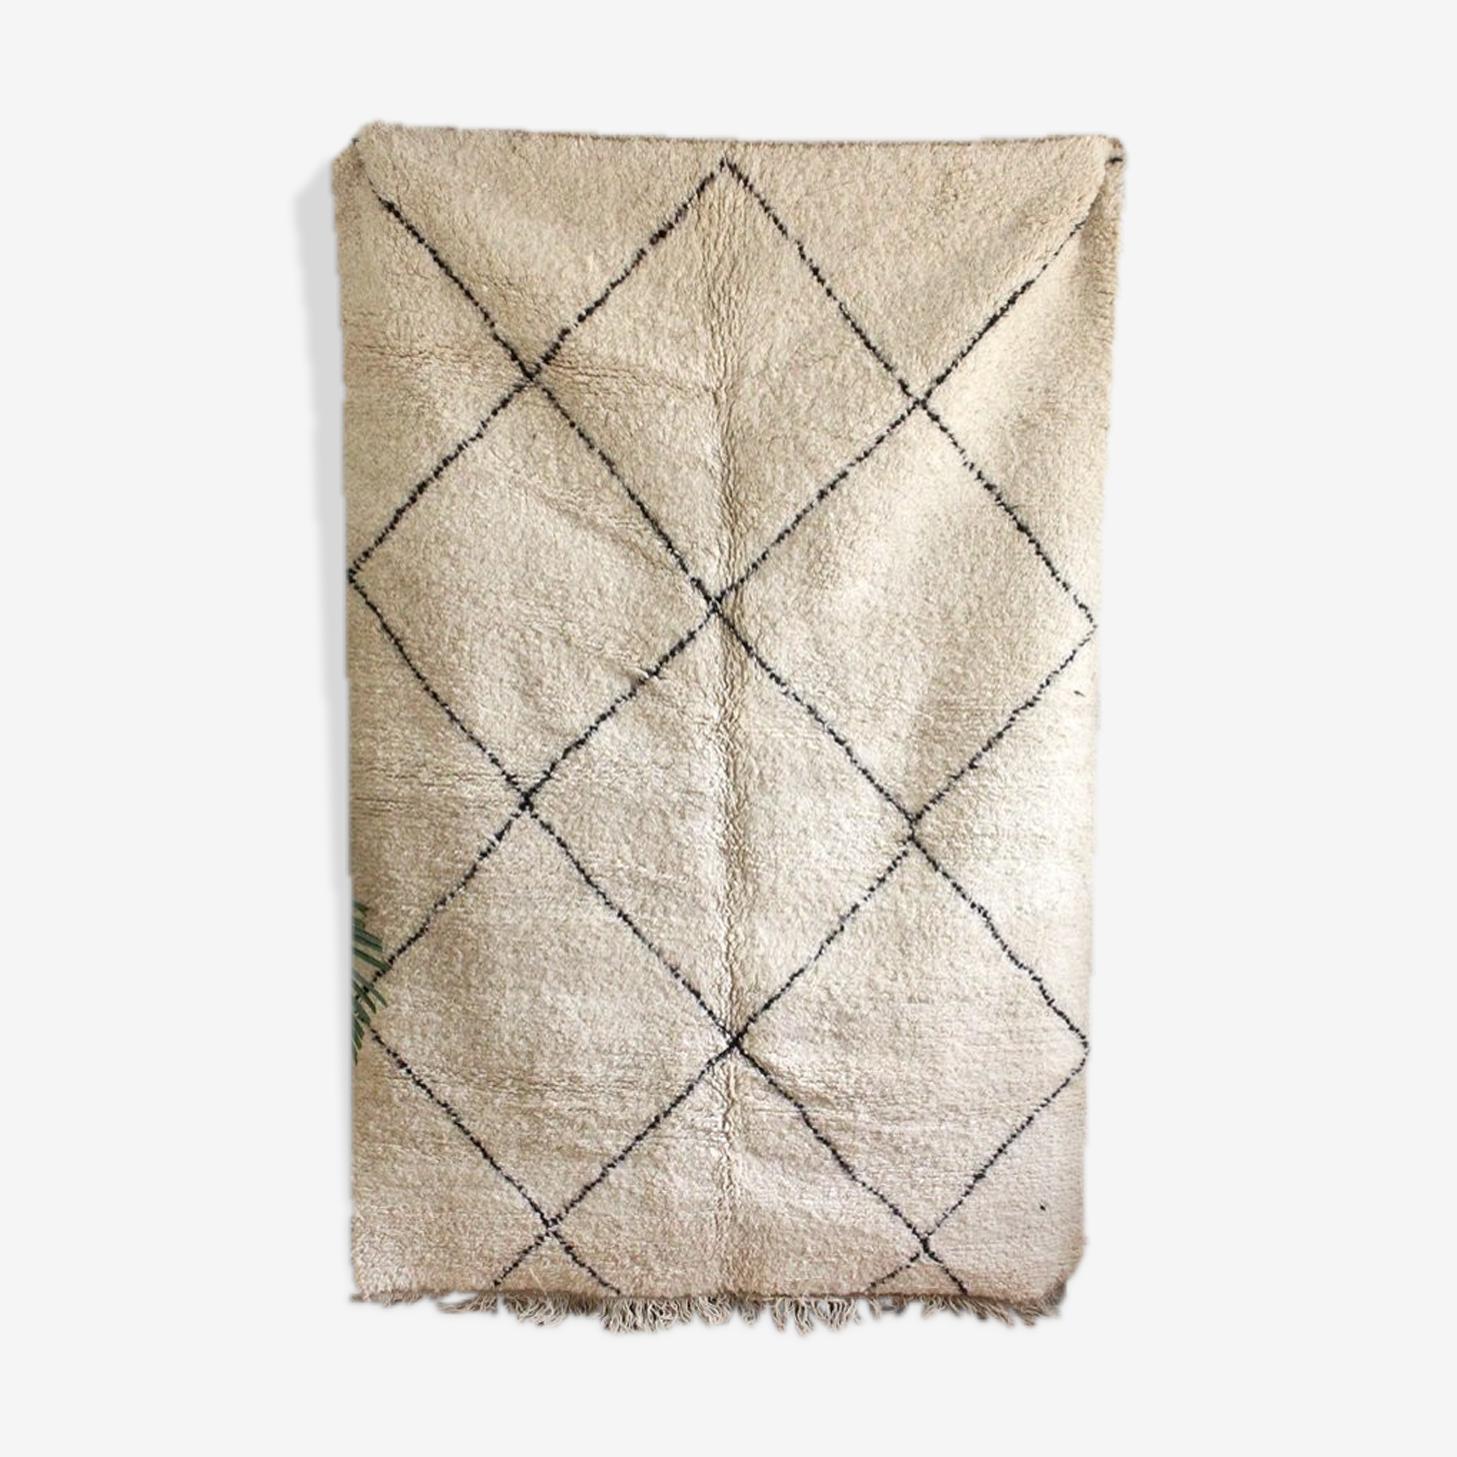 Beni ouarain woven hand to the Morocco berber carpet  150x225cm